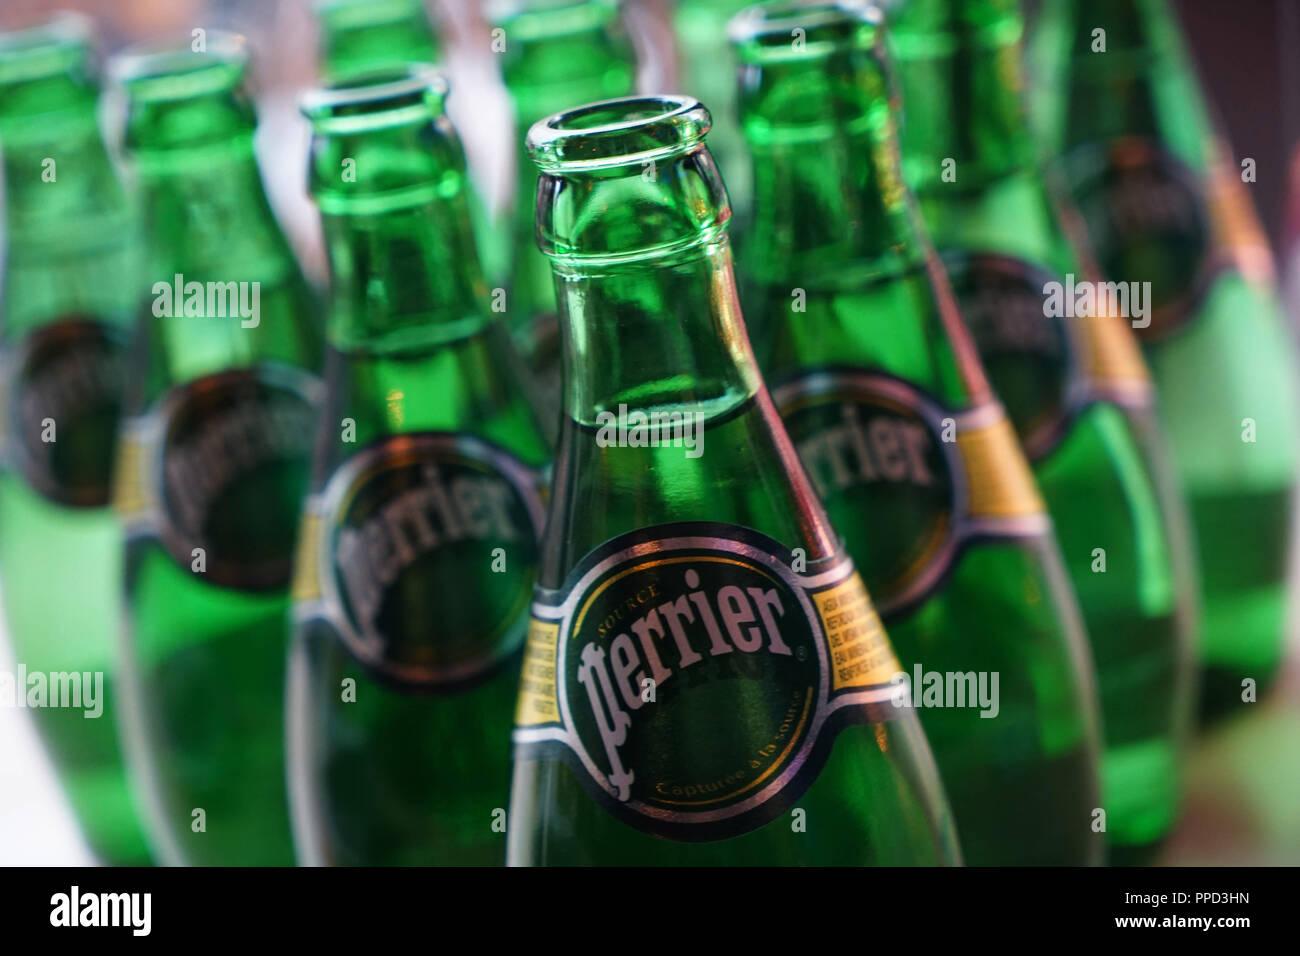 Munich, 04.12.2016 / Photo: Robert Haas. Mineral water bottles of the brand 'Perrier' in the 'Brasserie Bleue' in the Feinkost Kaefer Stammhaus in Prinzregentenstrasse. - Stock Image